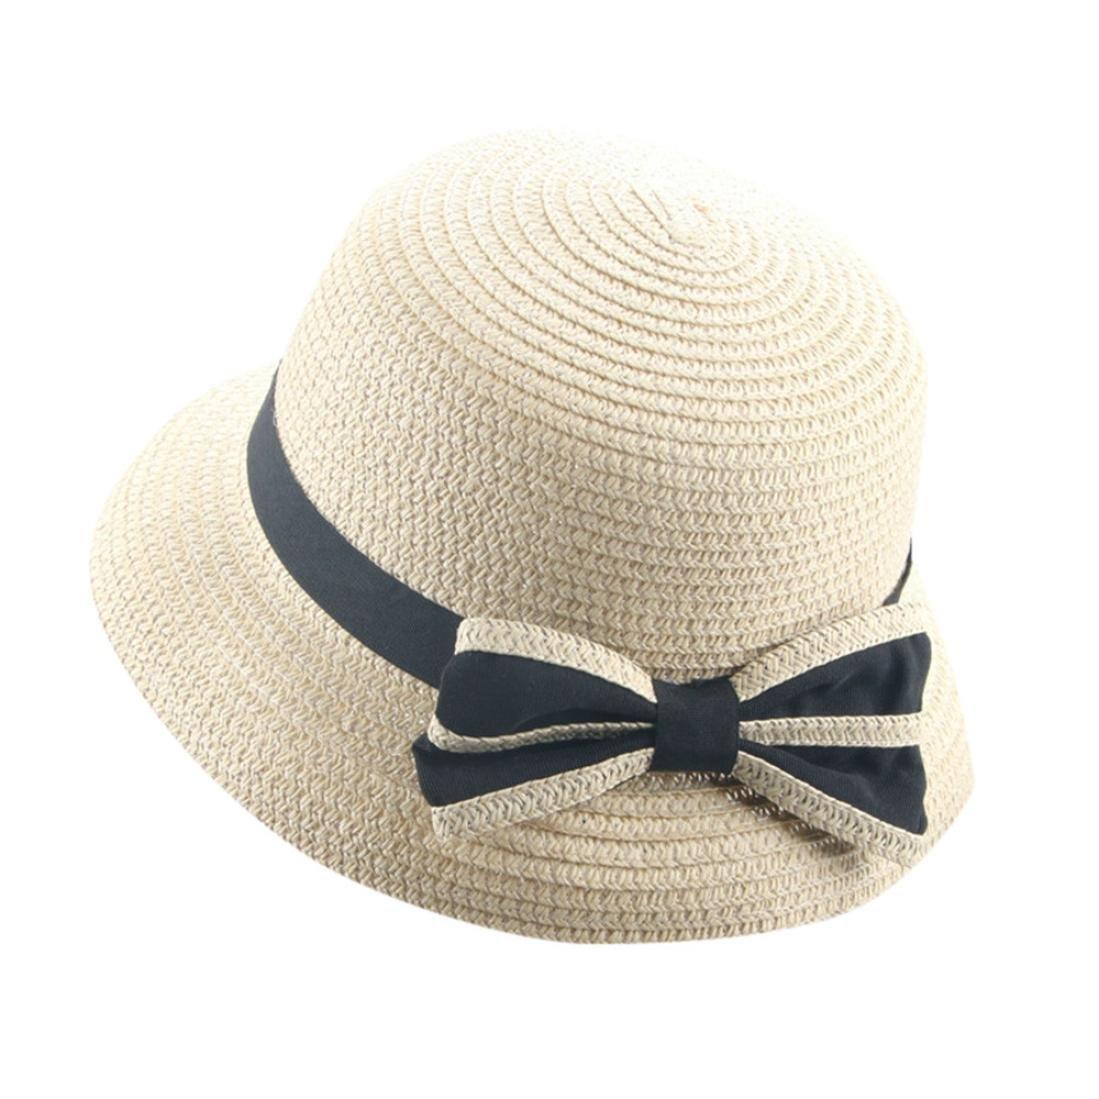 d4d055a08e1b3 Amazon.com  Caopixx Children Hats